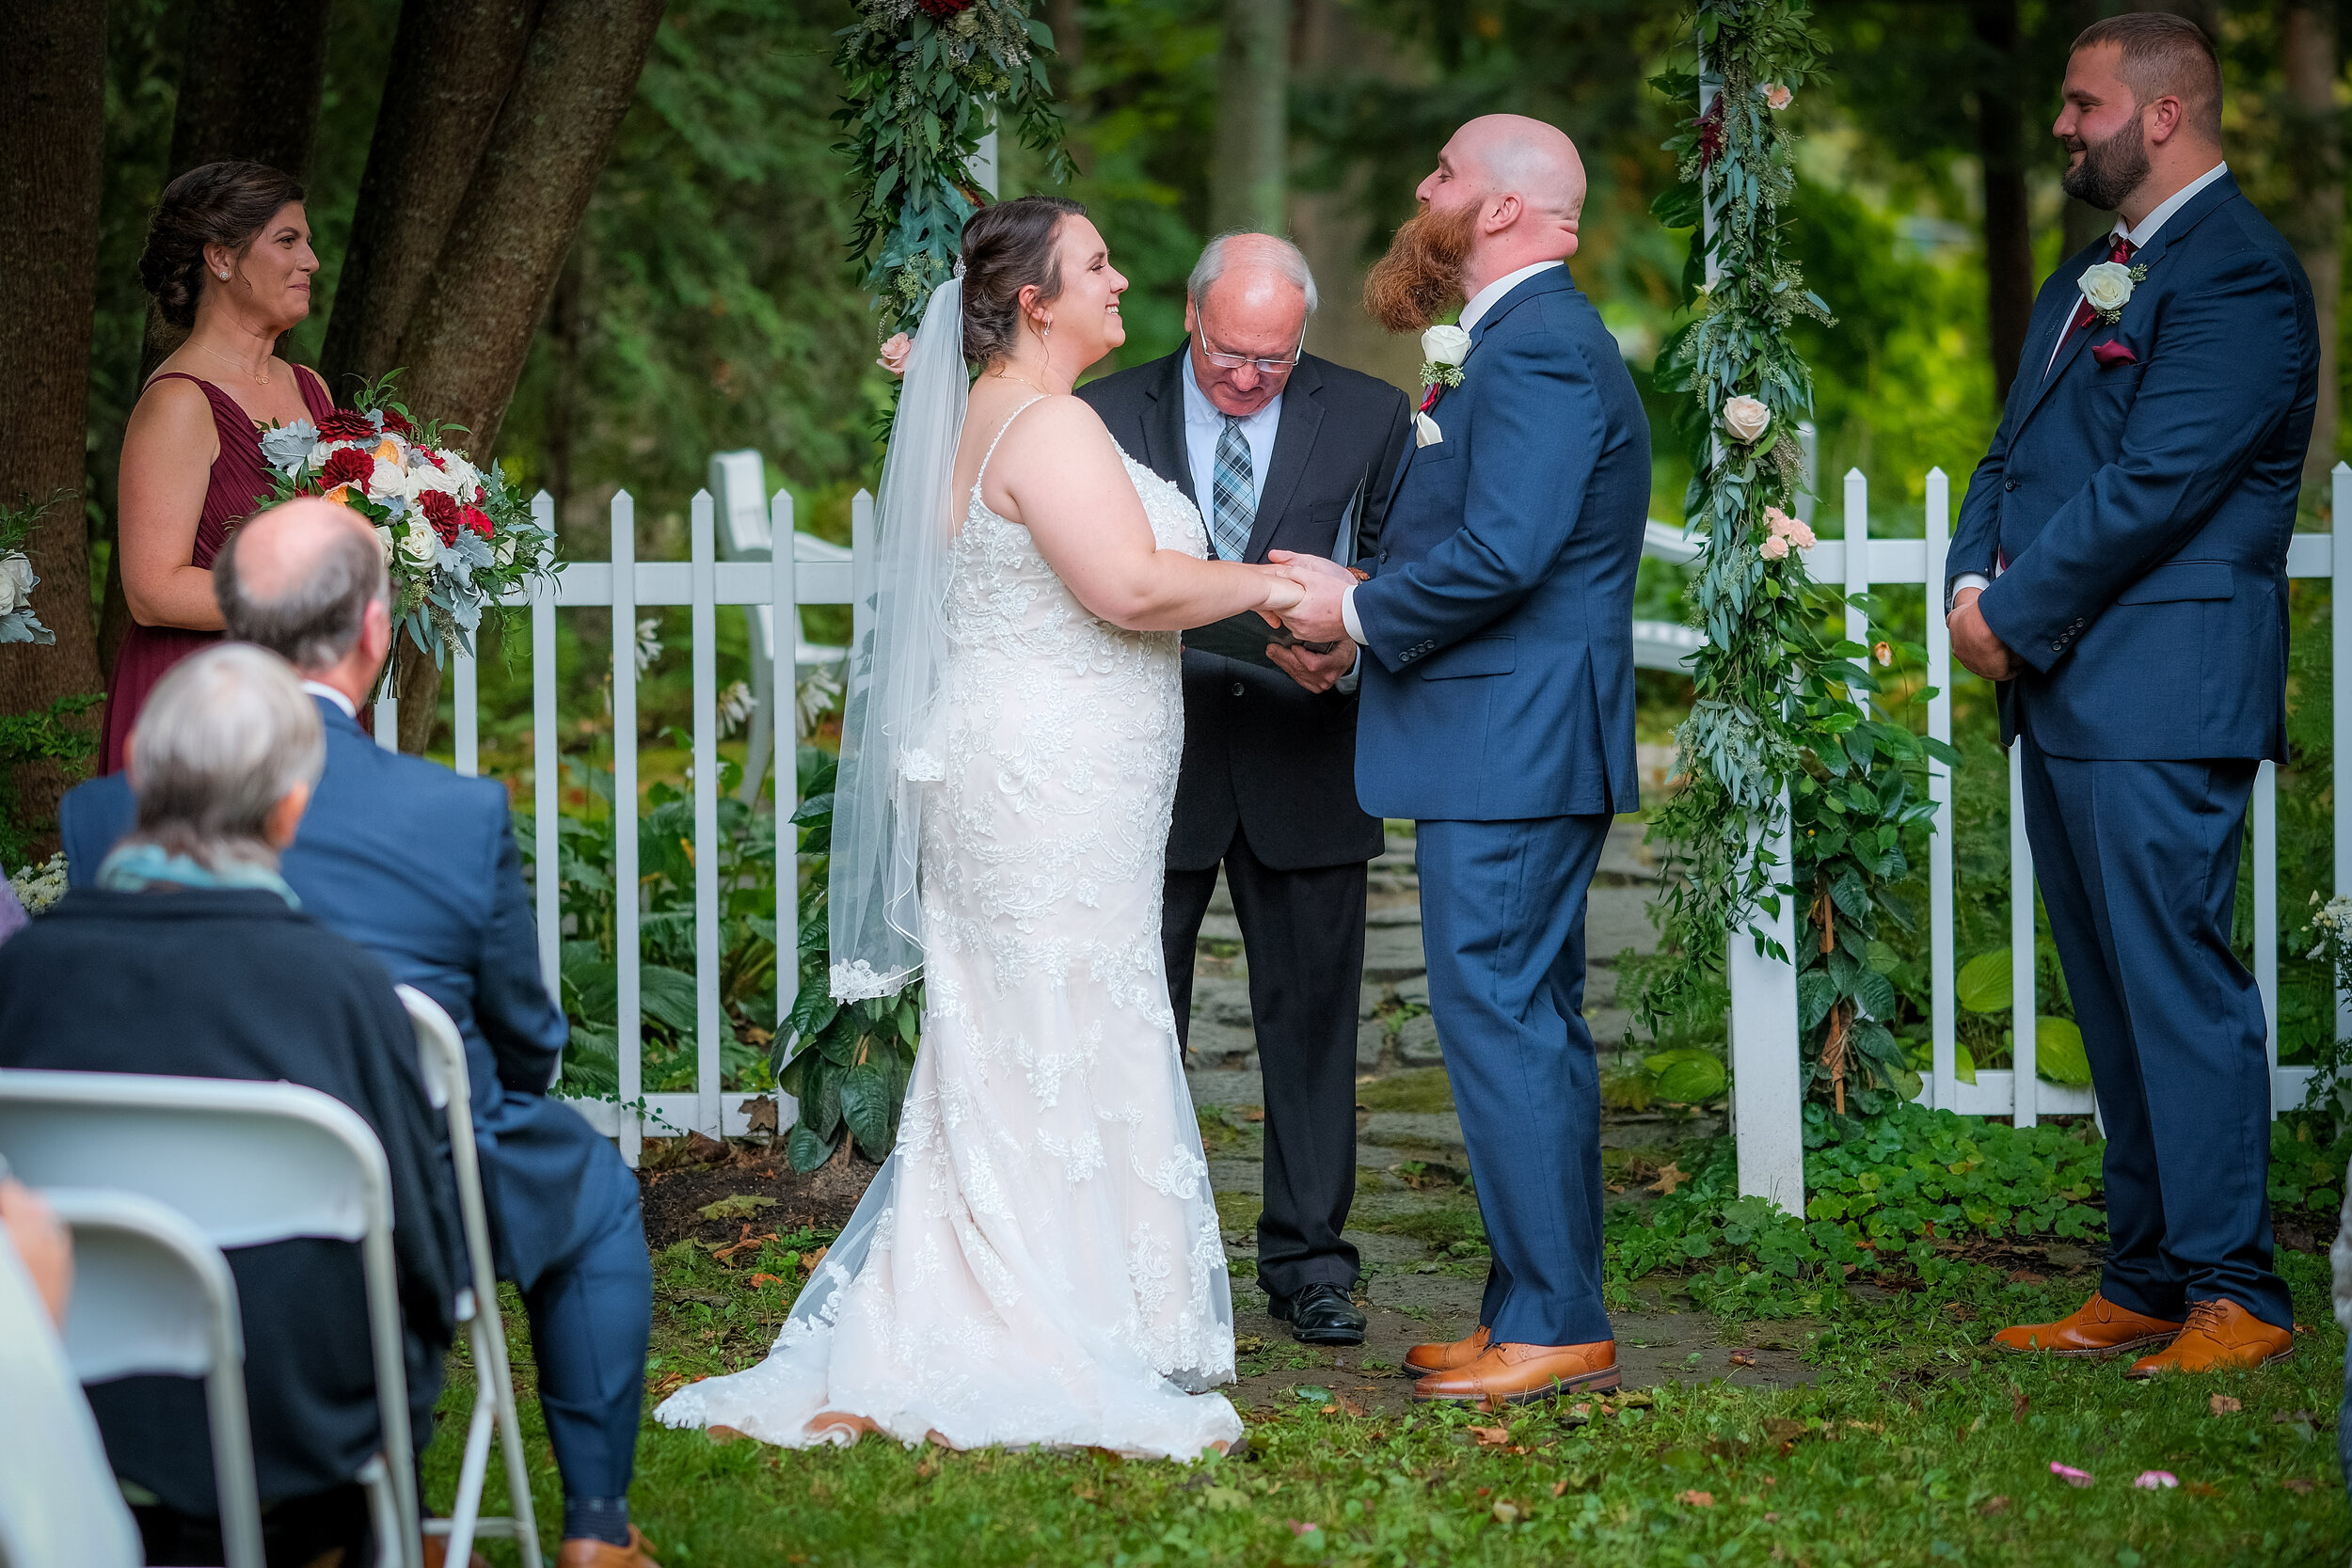 three-chimneys-inn-wedding-photography-595.jpg